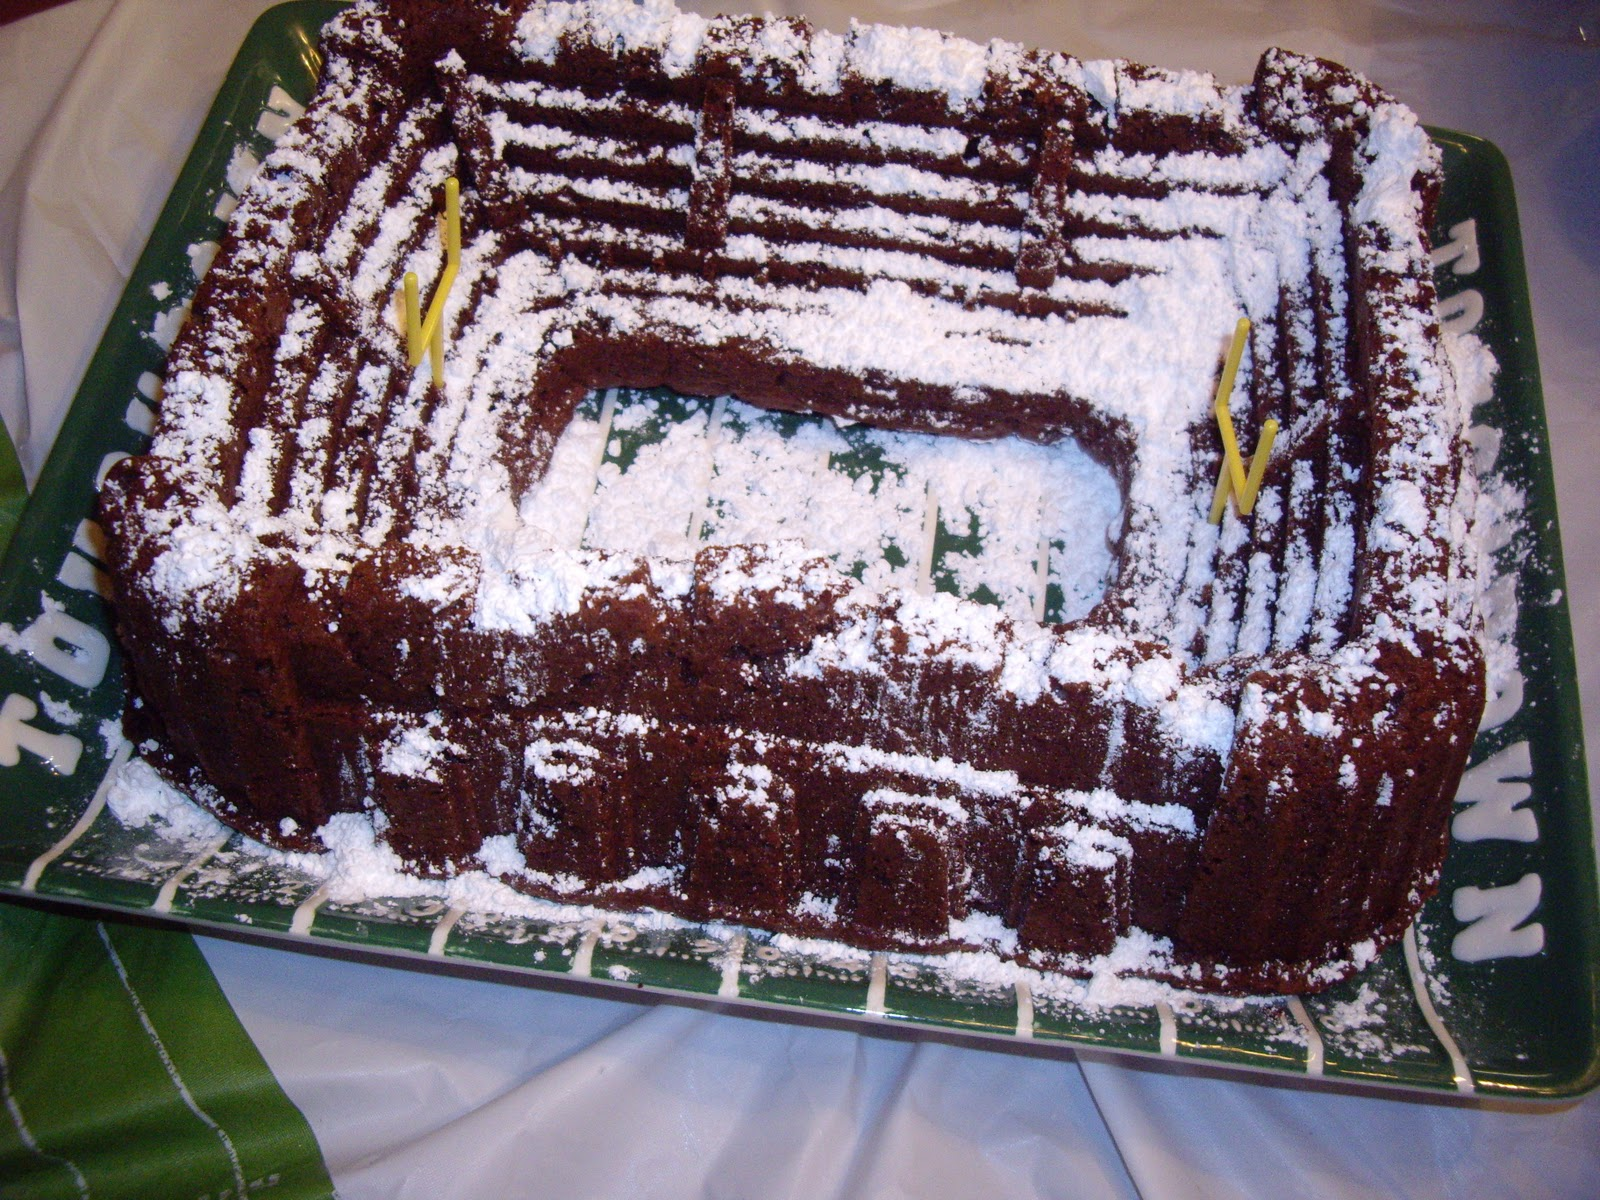 Kahlua bundt cake recipe